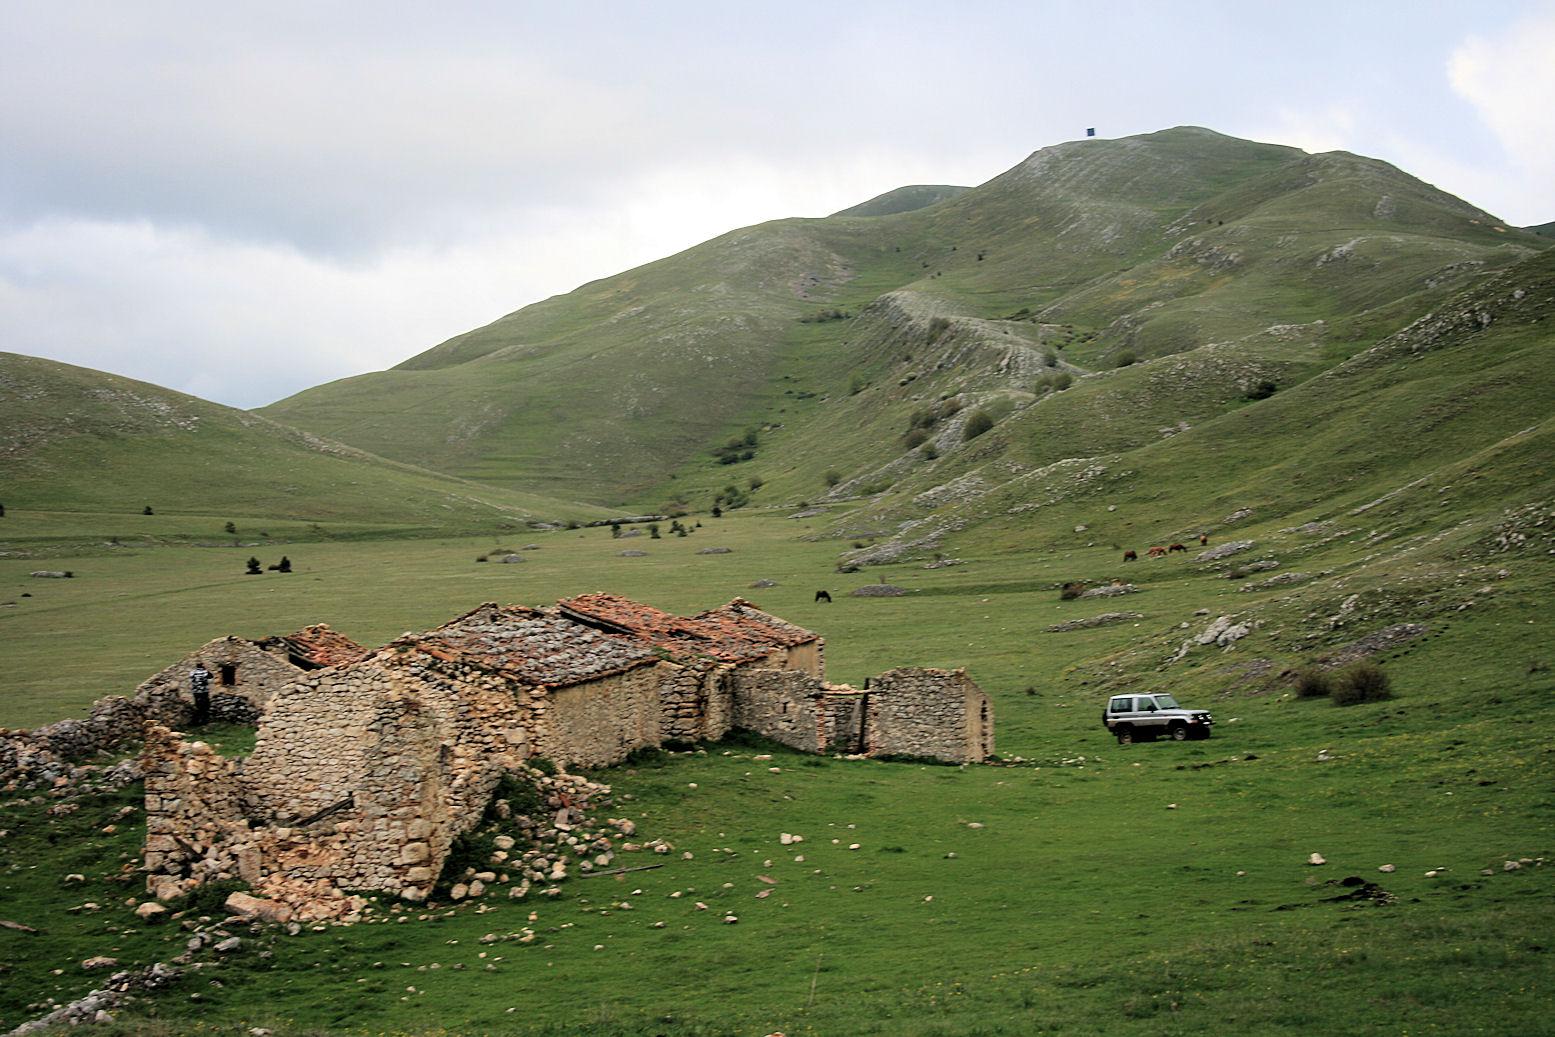 Montagna di Roio